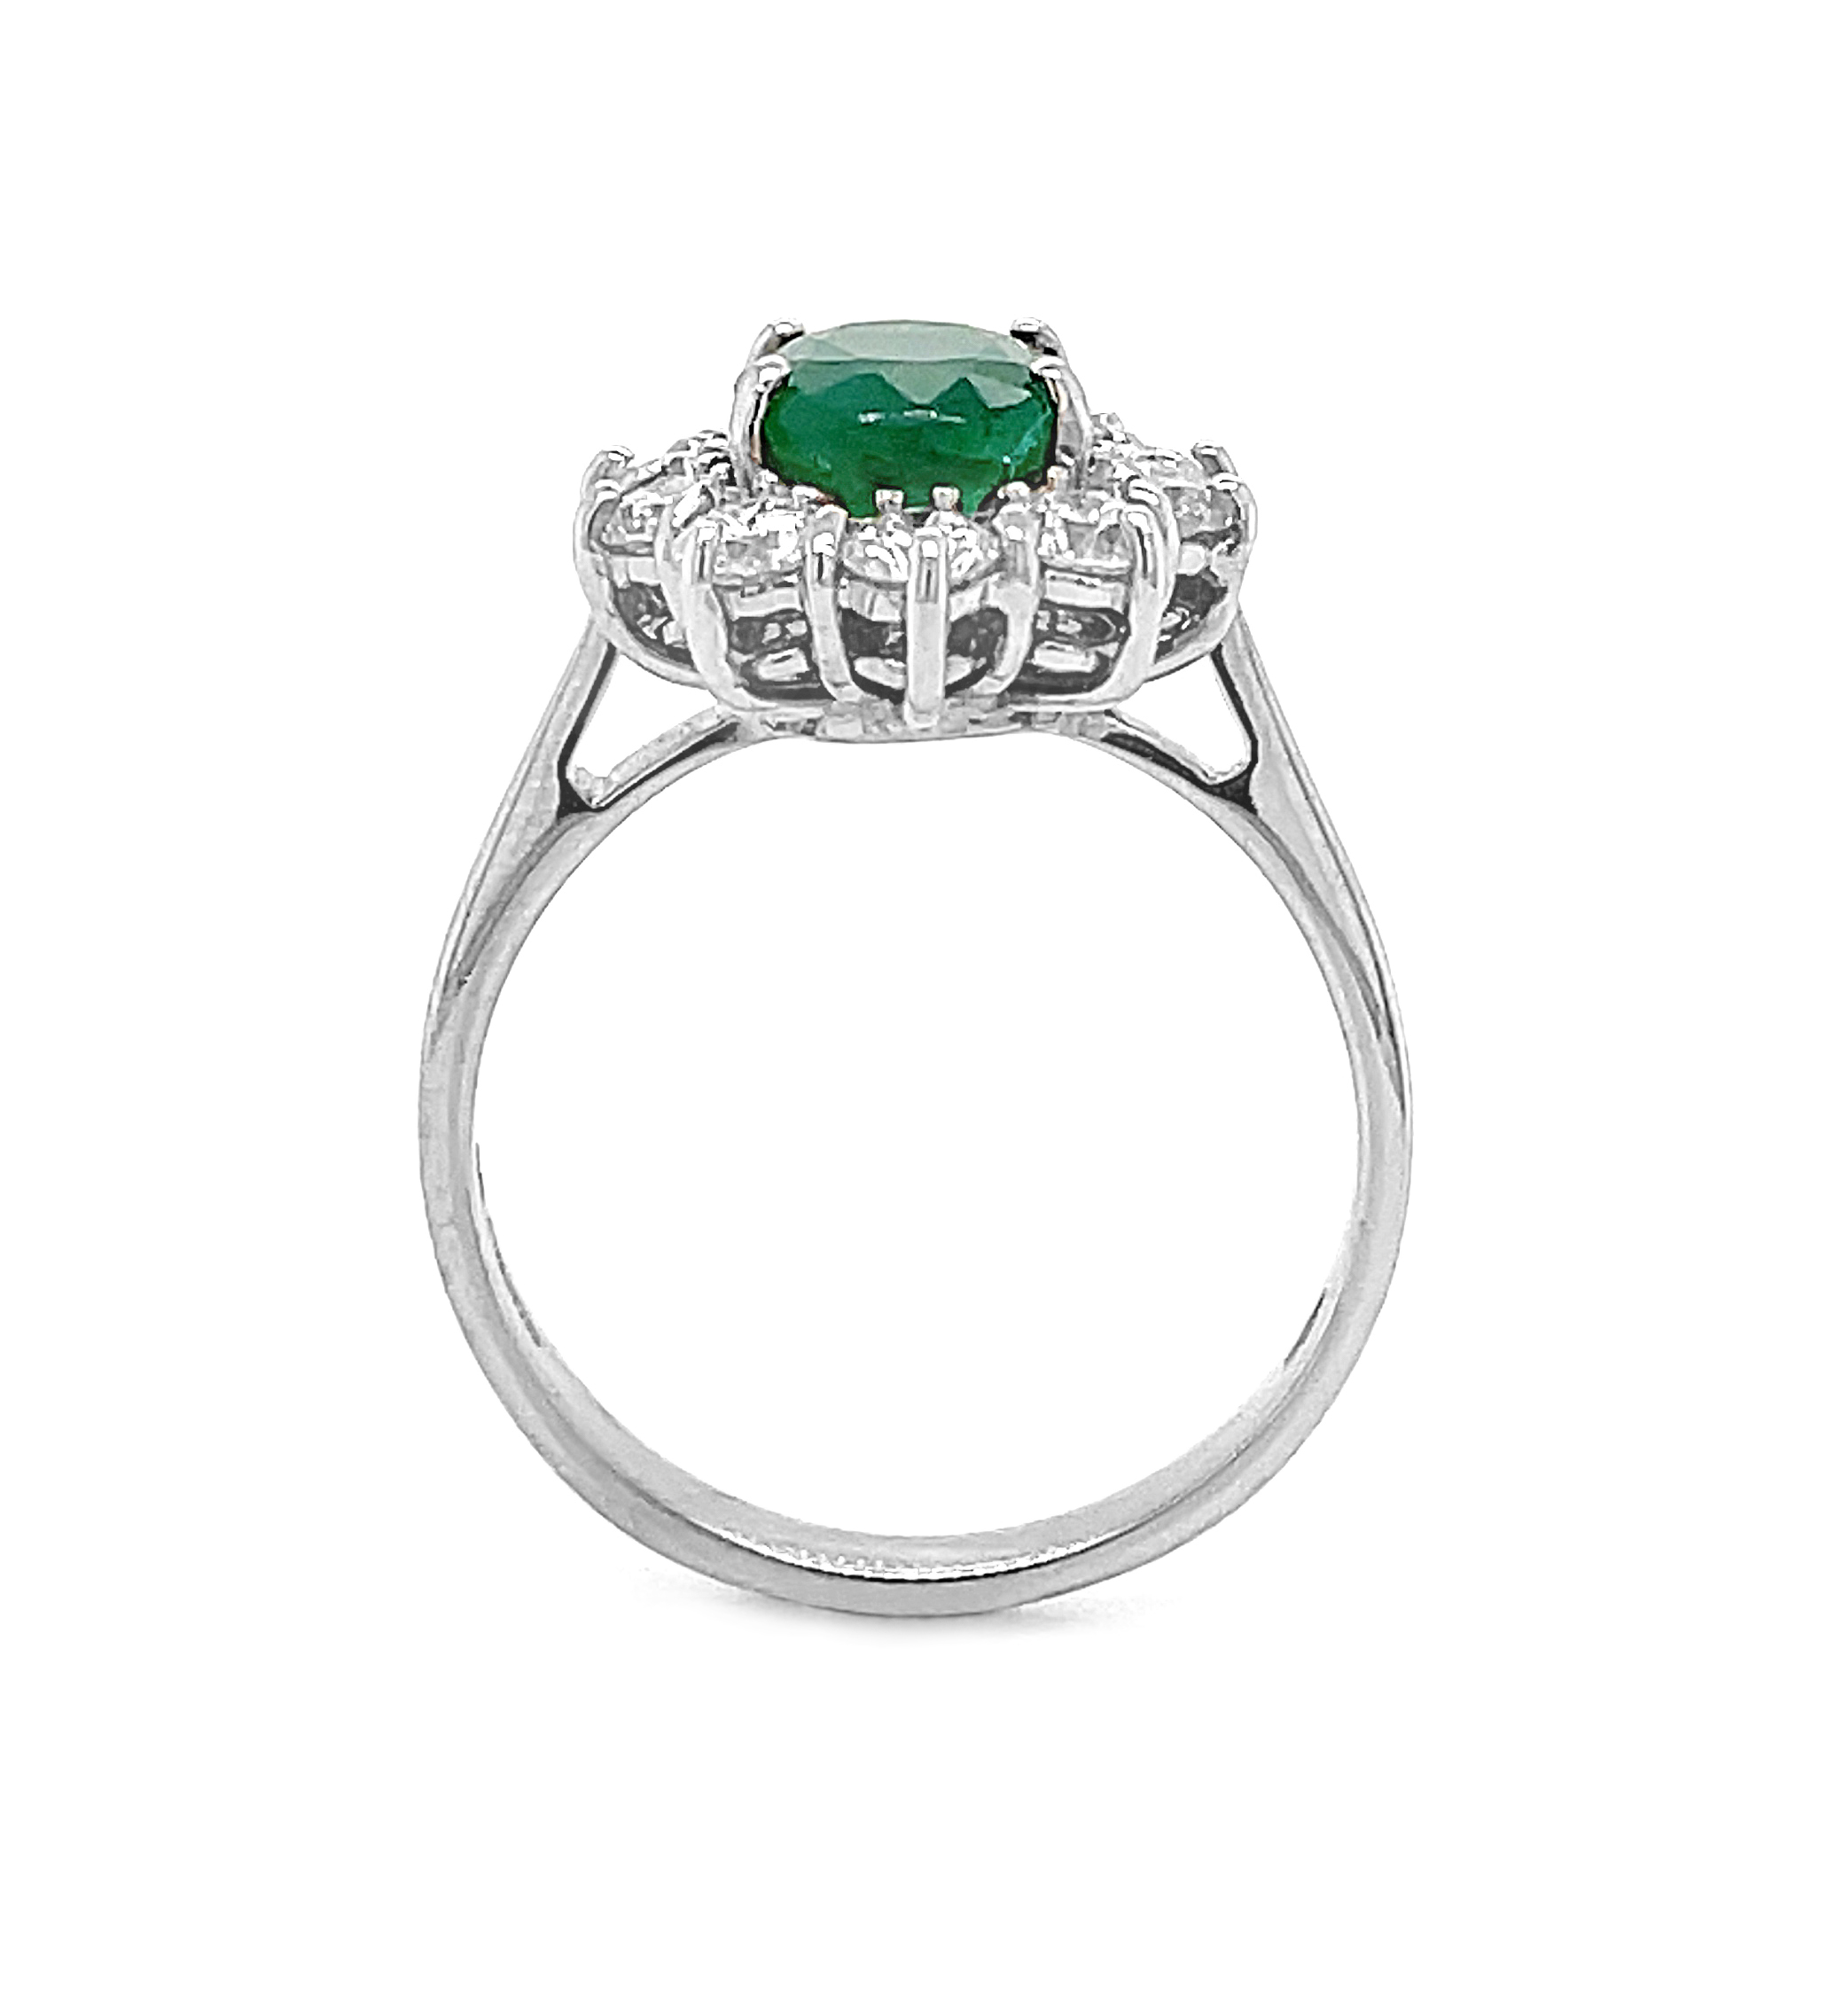 18k White Gold Oval Emerald & Brilliant Cut Diamond Cluster Ring